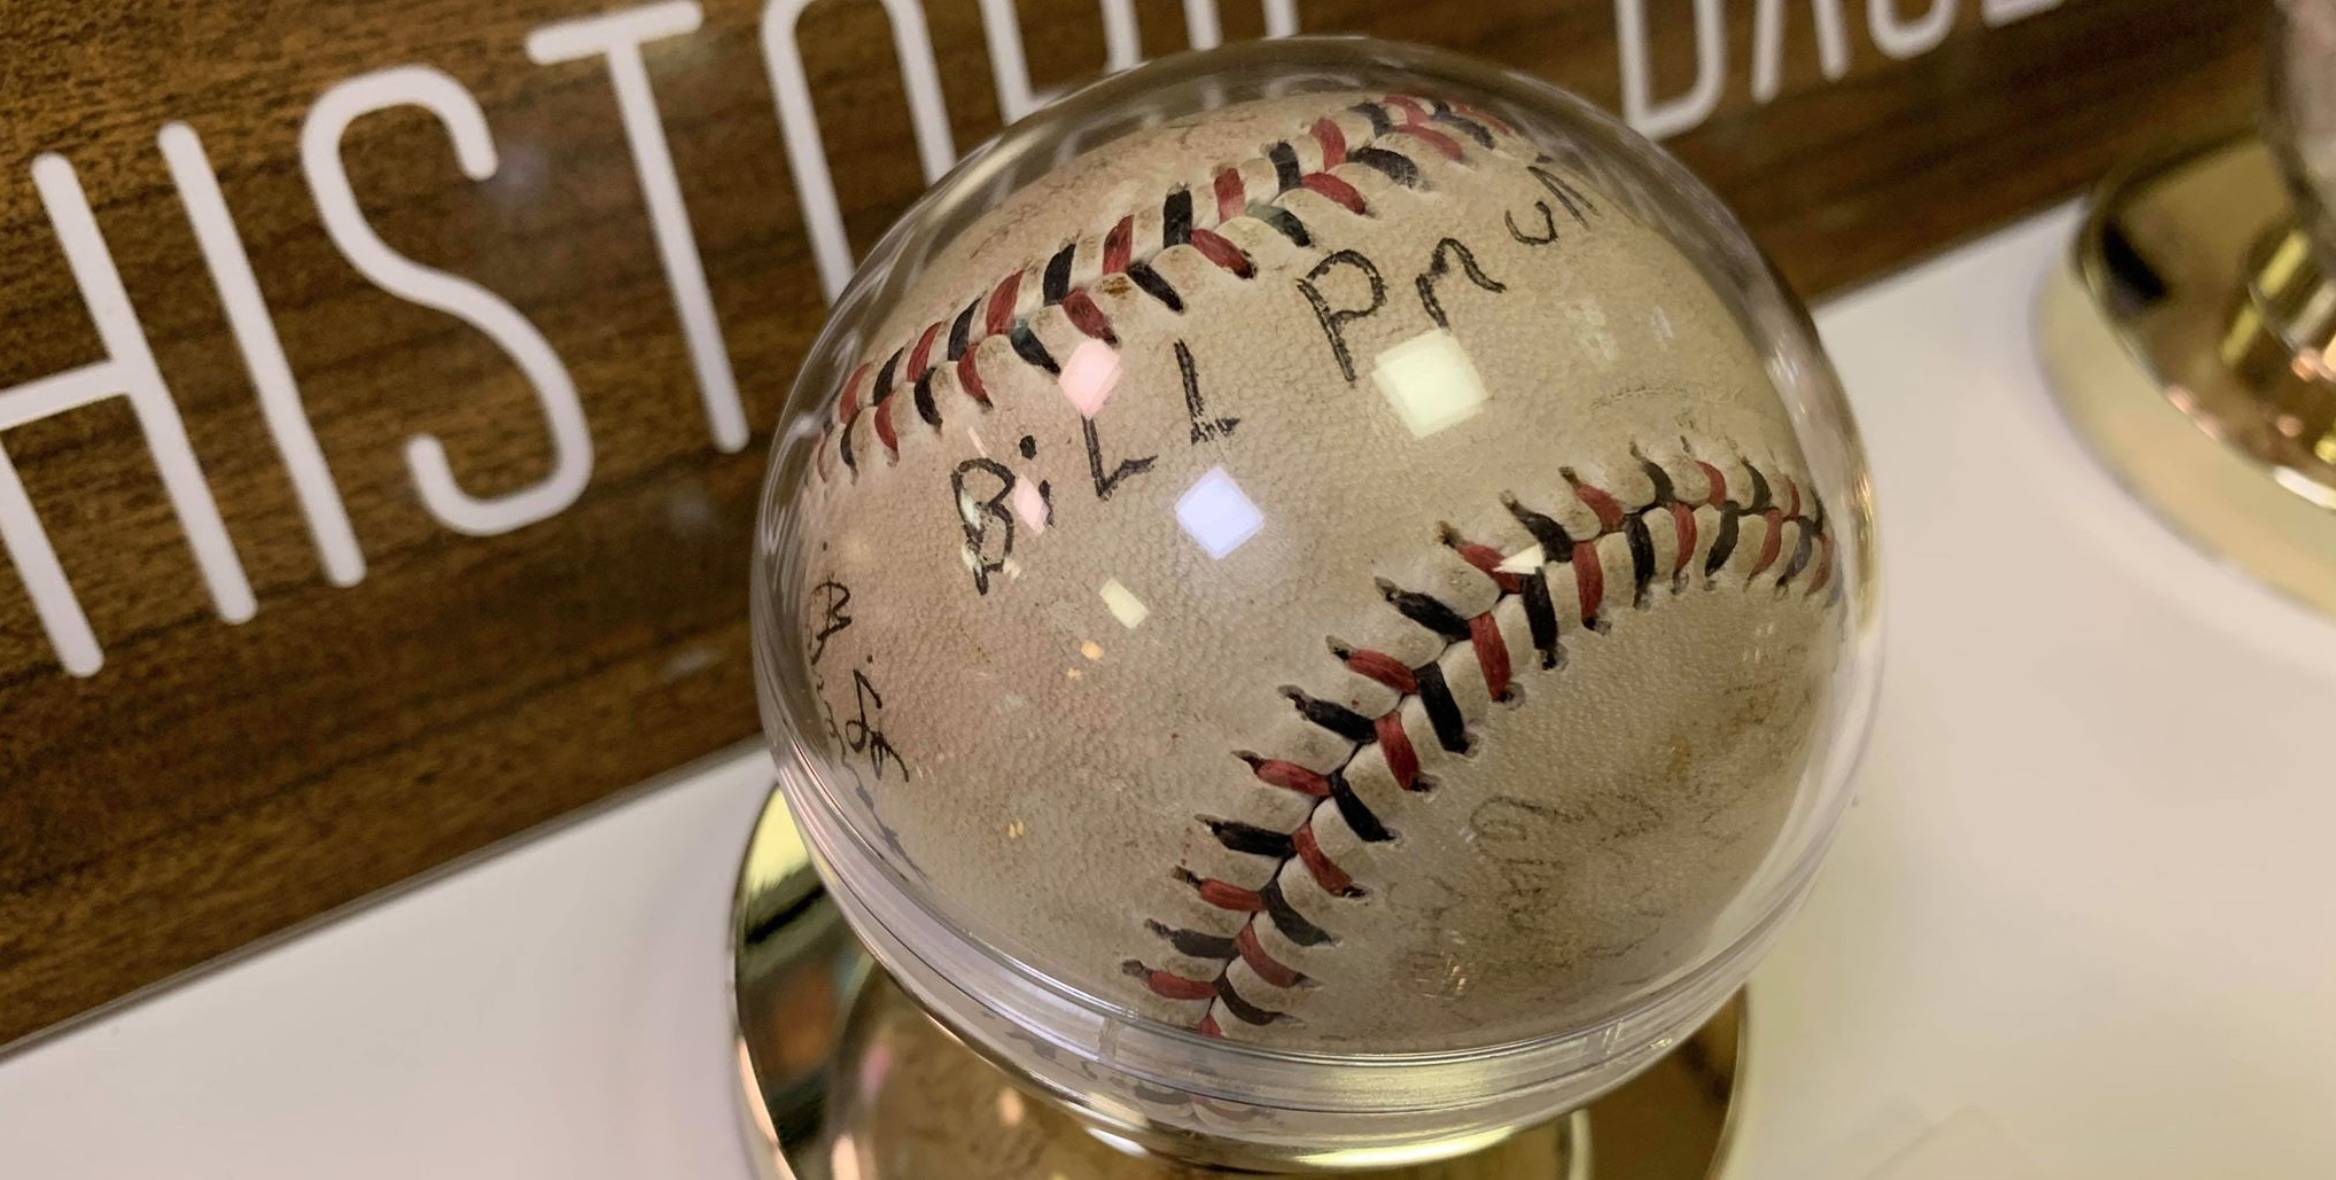 Photo of a signed baseball